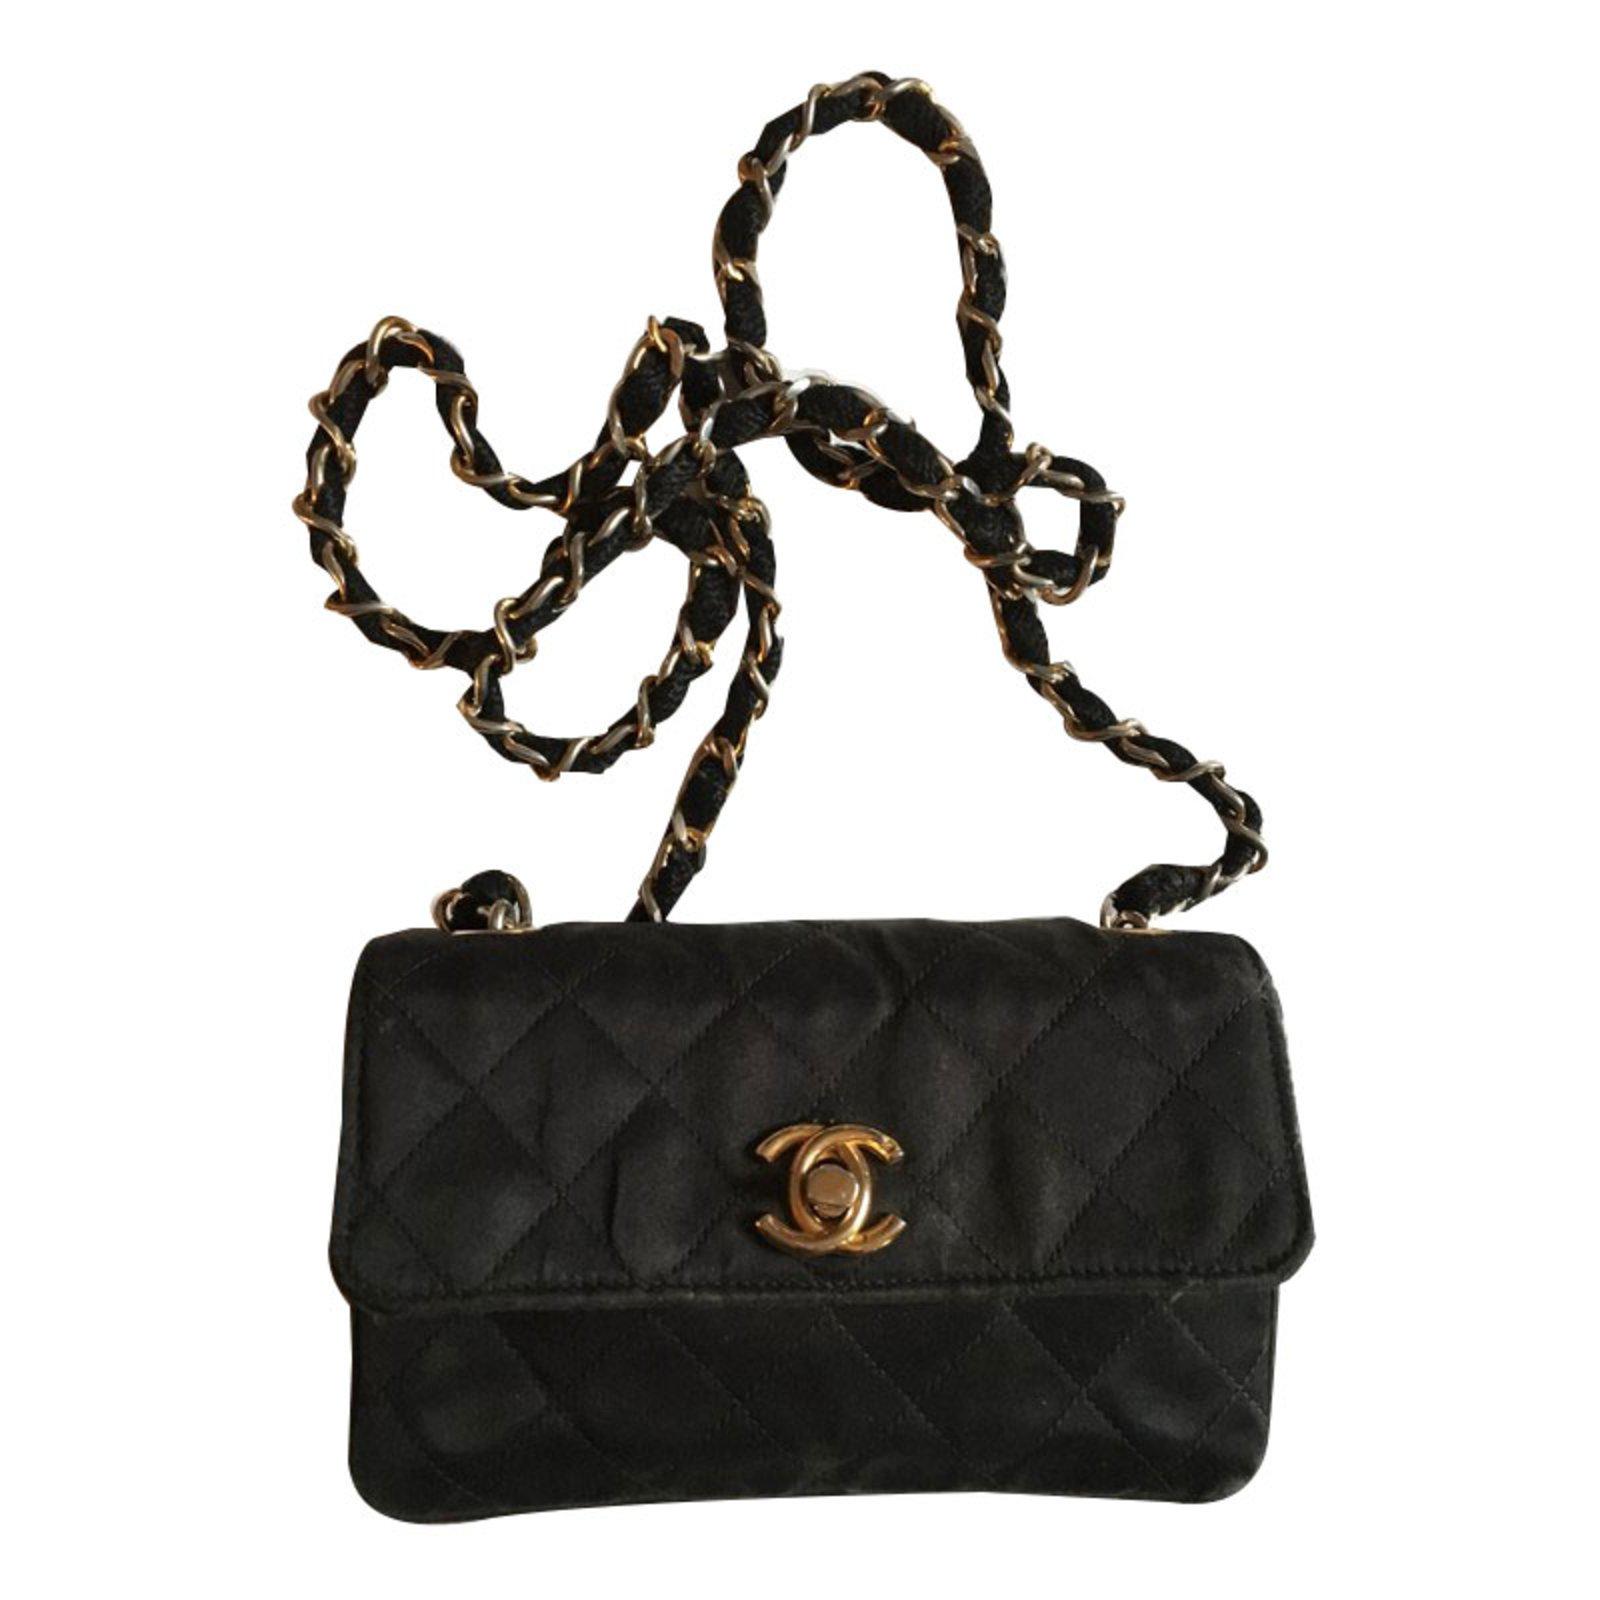 d32de0c61947 Chanel Handbags Handbags Satin Black ref.57401 - Joli Closet